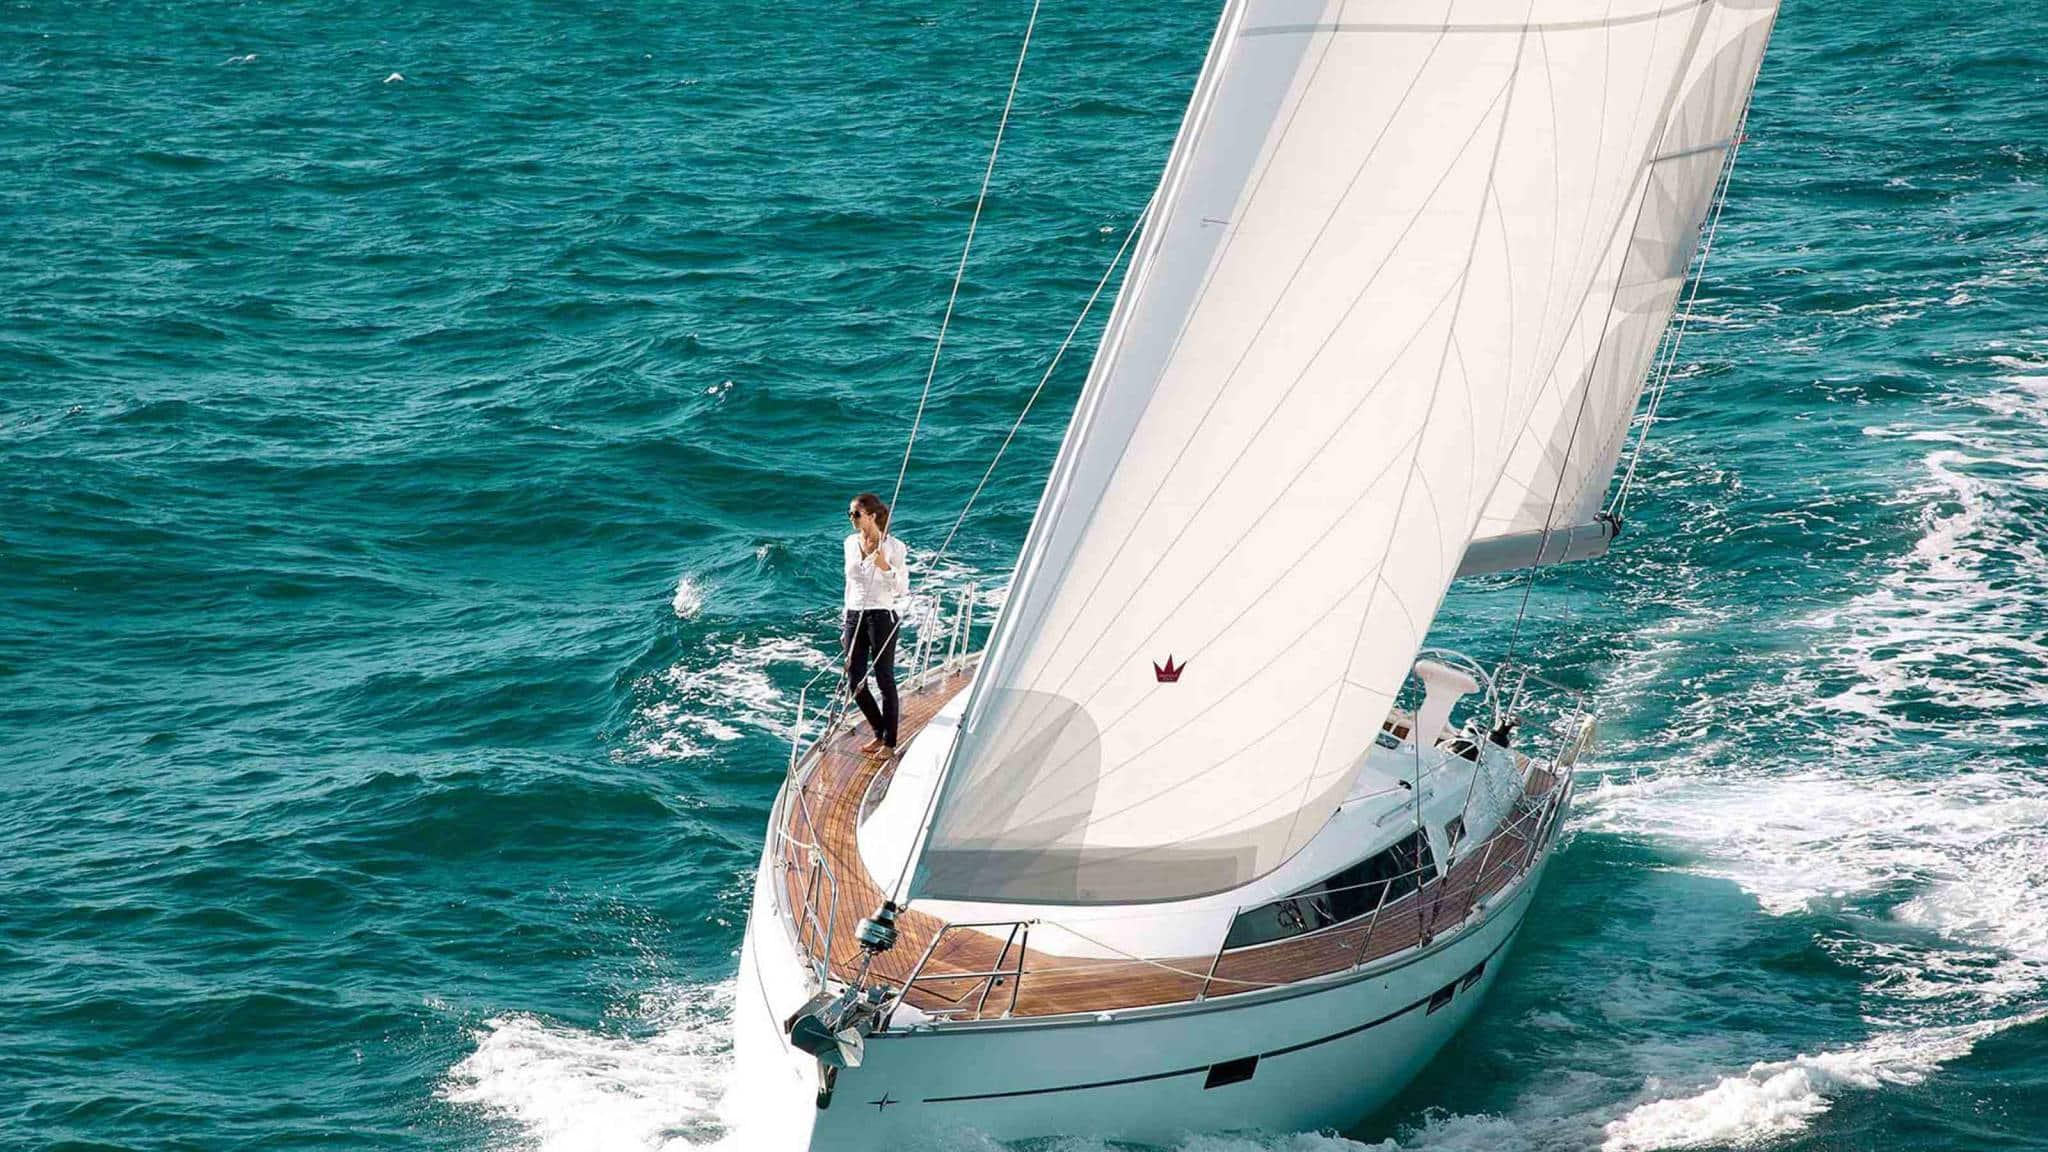 woman enjoys the Bavaria 41 Cruiser